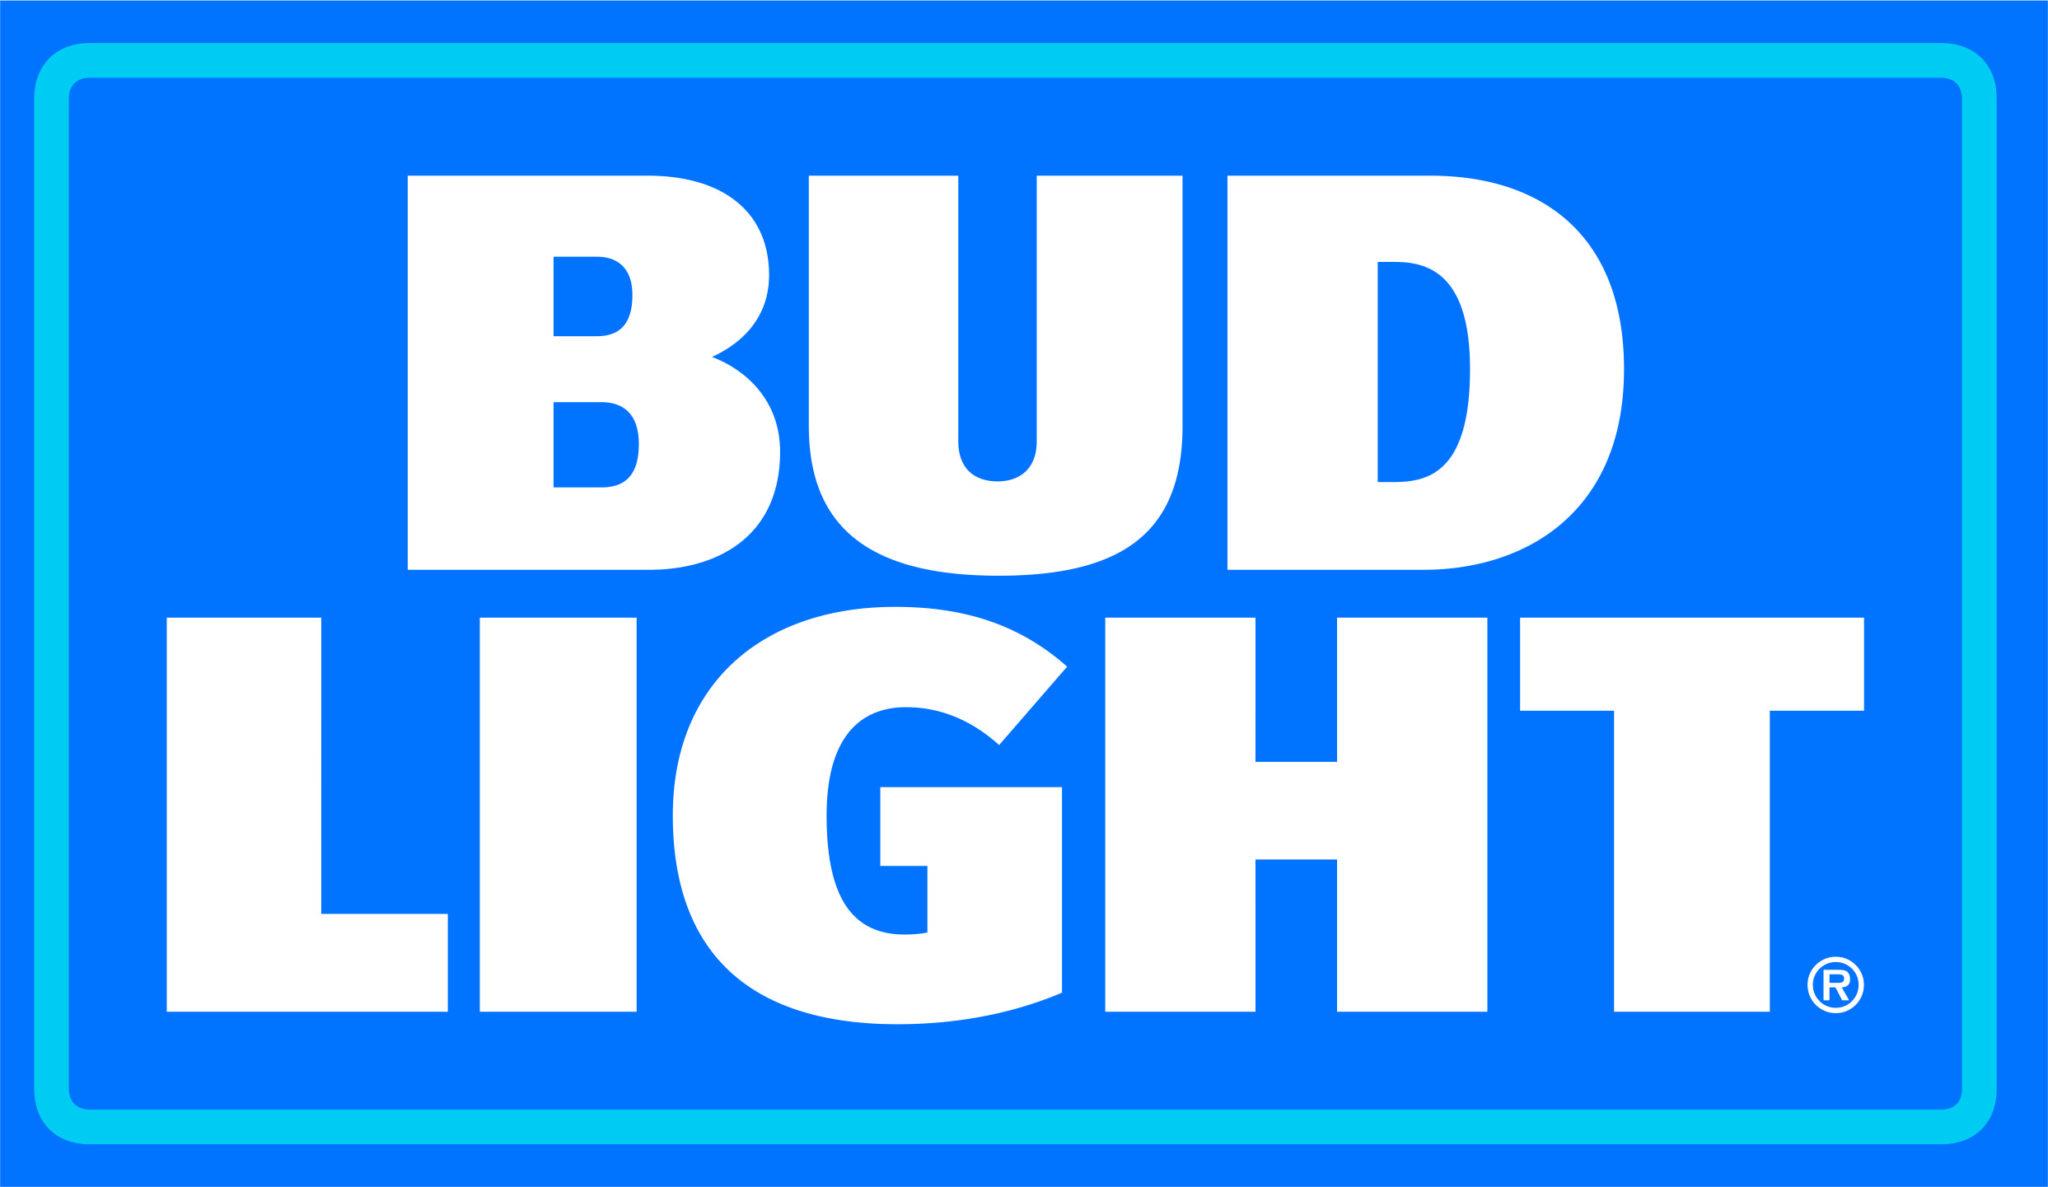 bud-light-logo   South Florida Garlic Fest